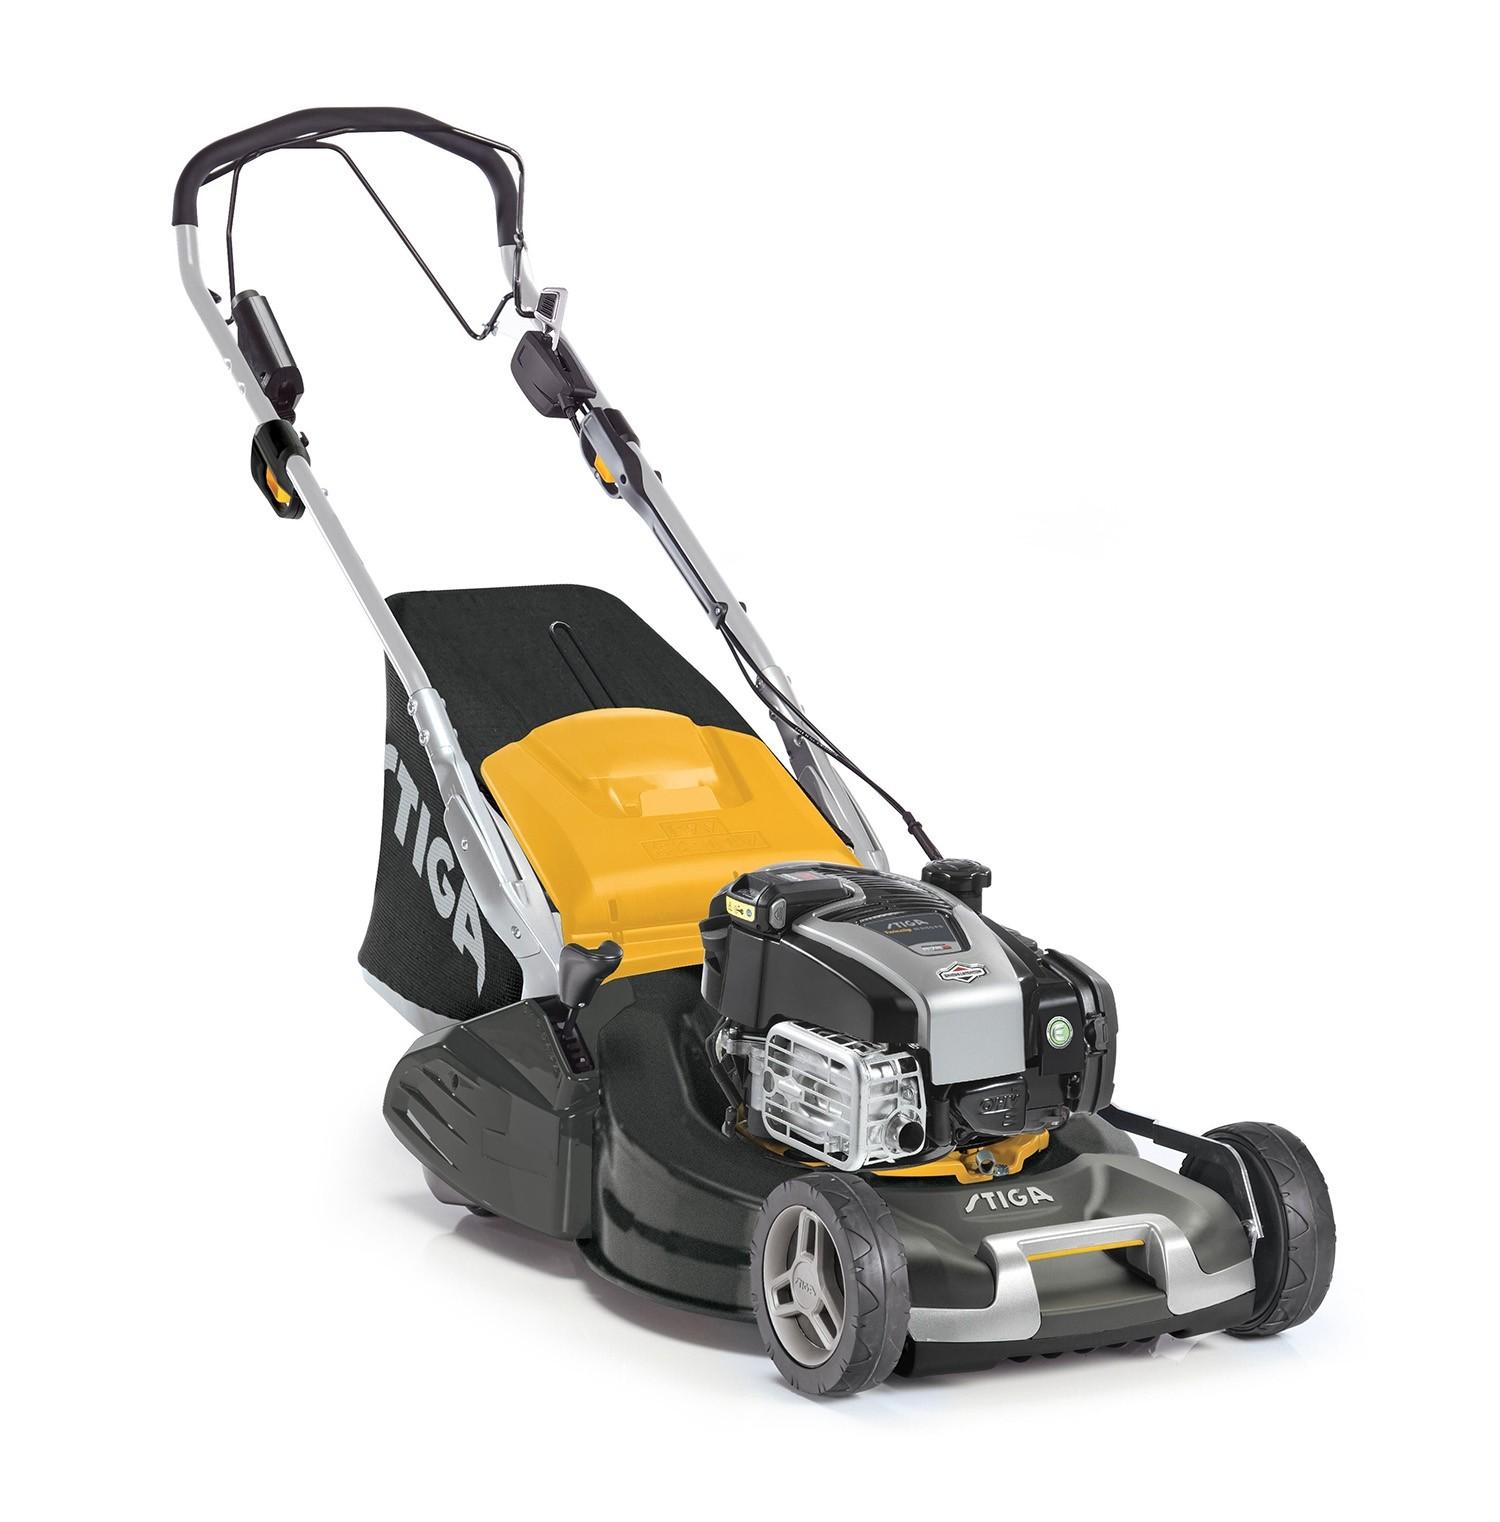 twinclip 50 sve r lawnmower